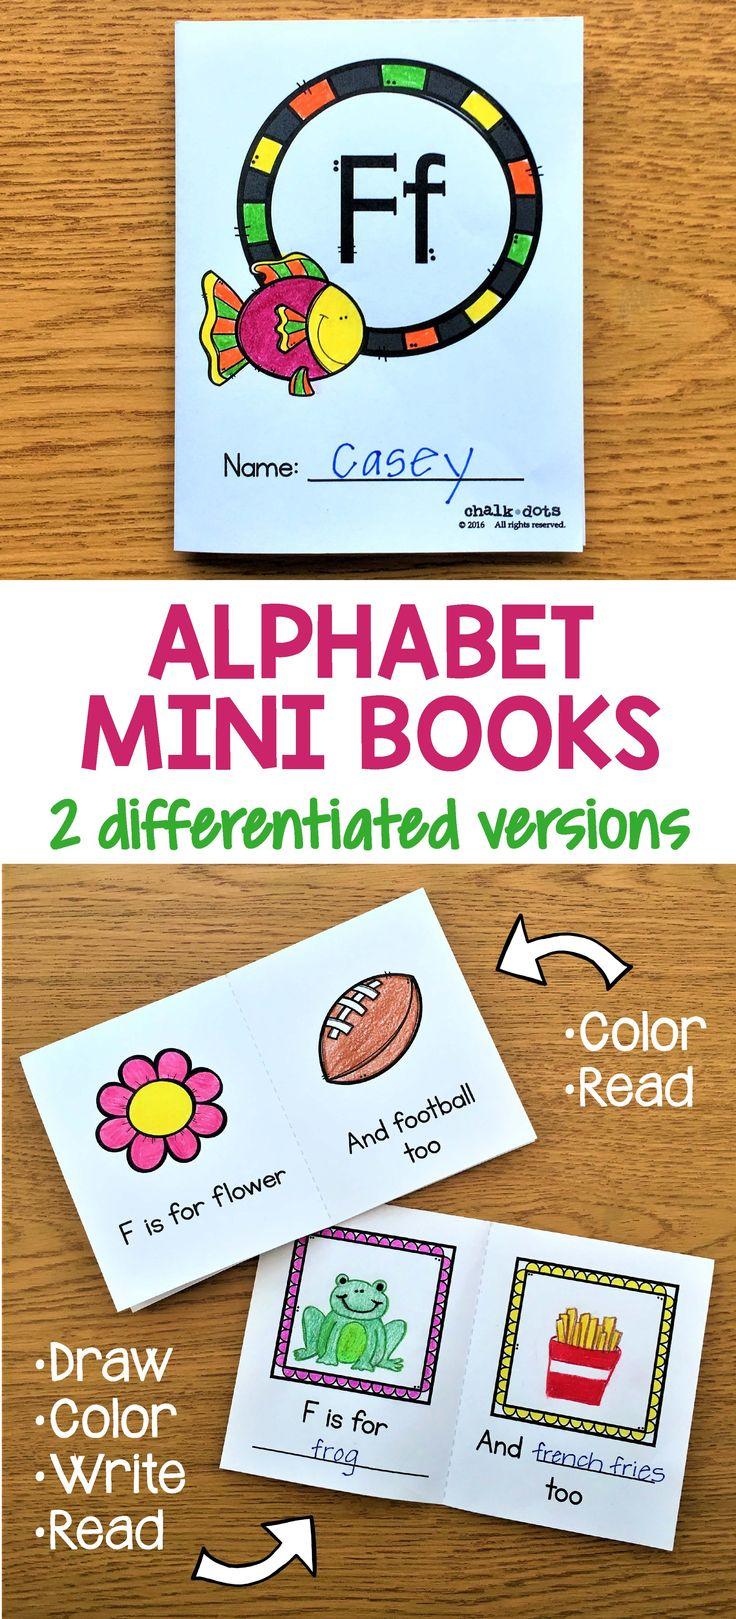 51 best Kindergarten images on Pinterest | Classroom ideas, Day care ...